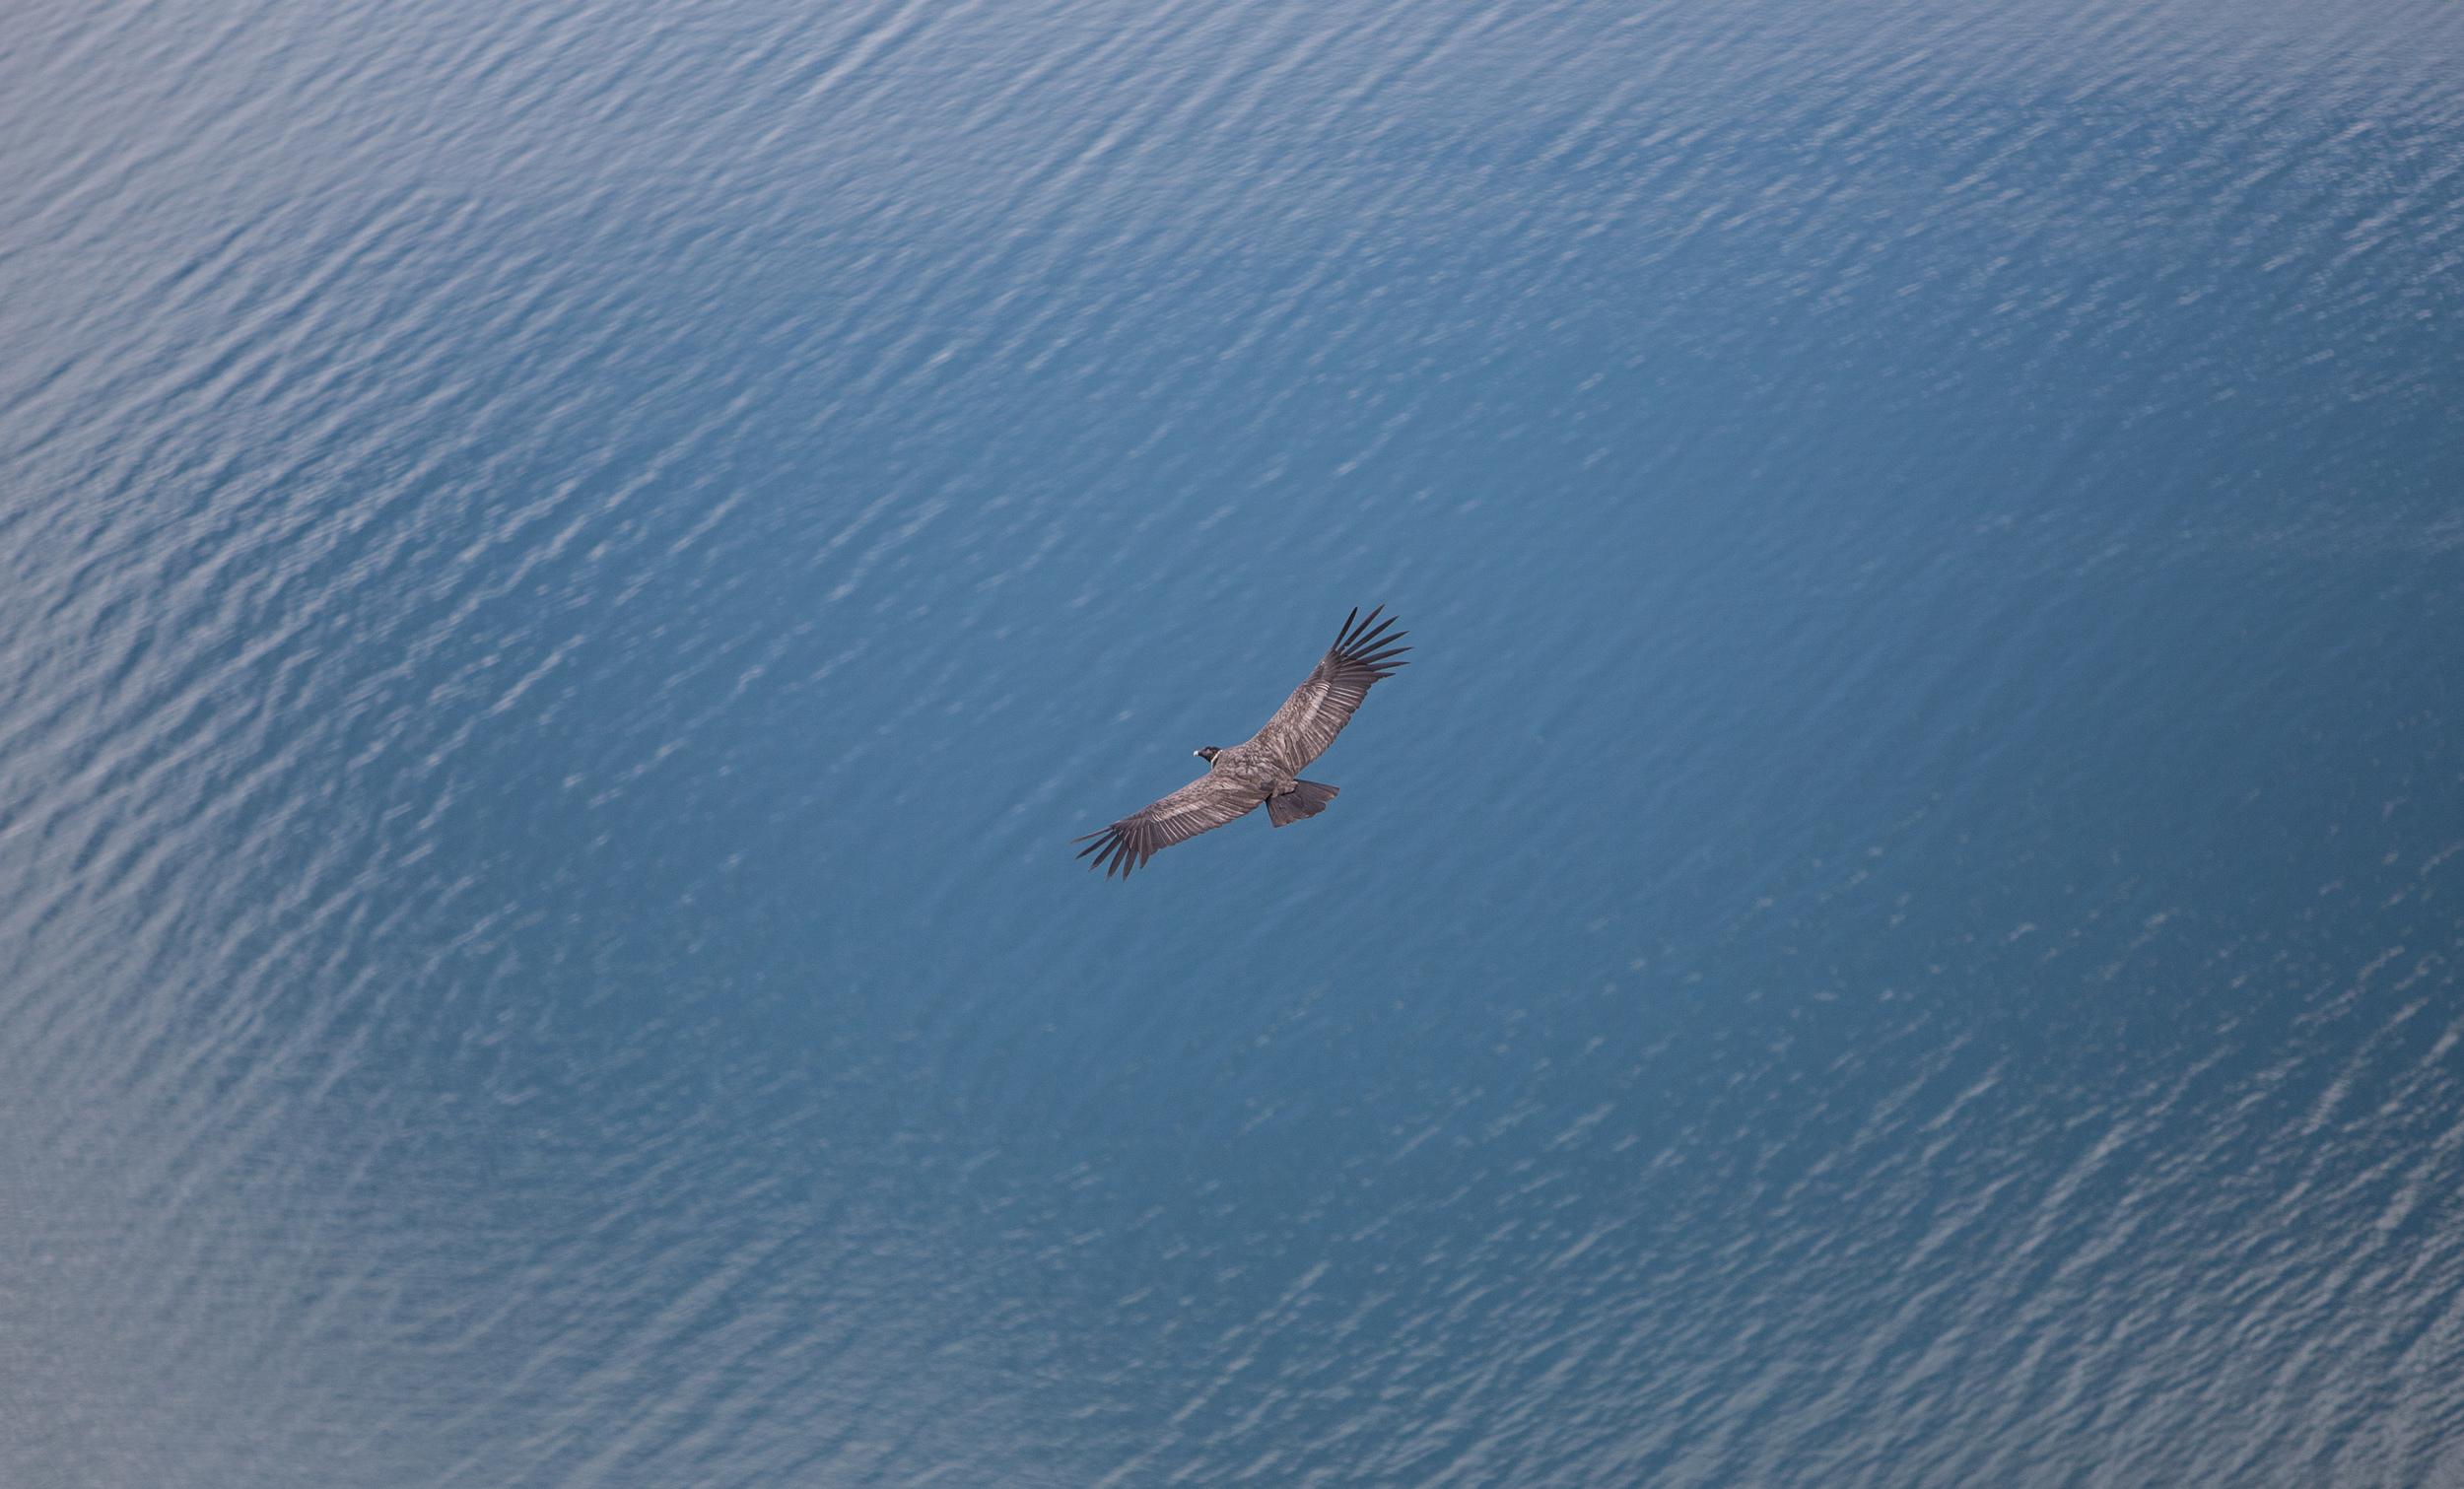 A juvenile condor soars over the Fjord. P: Carla Riccobon